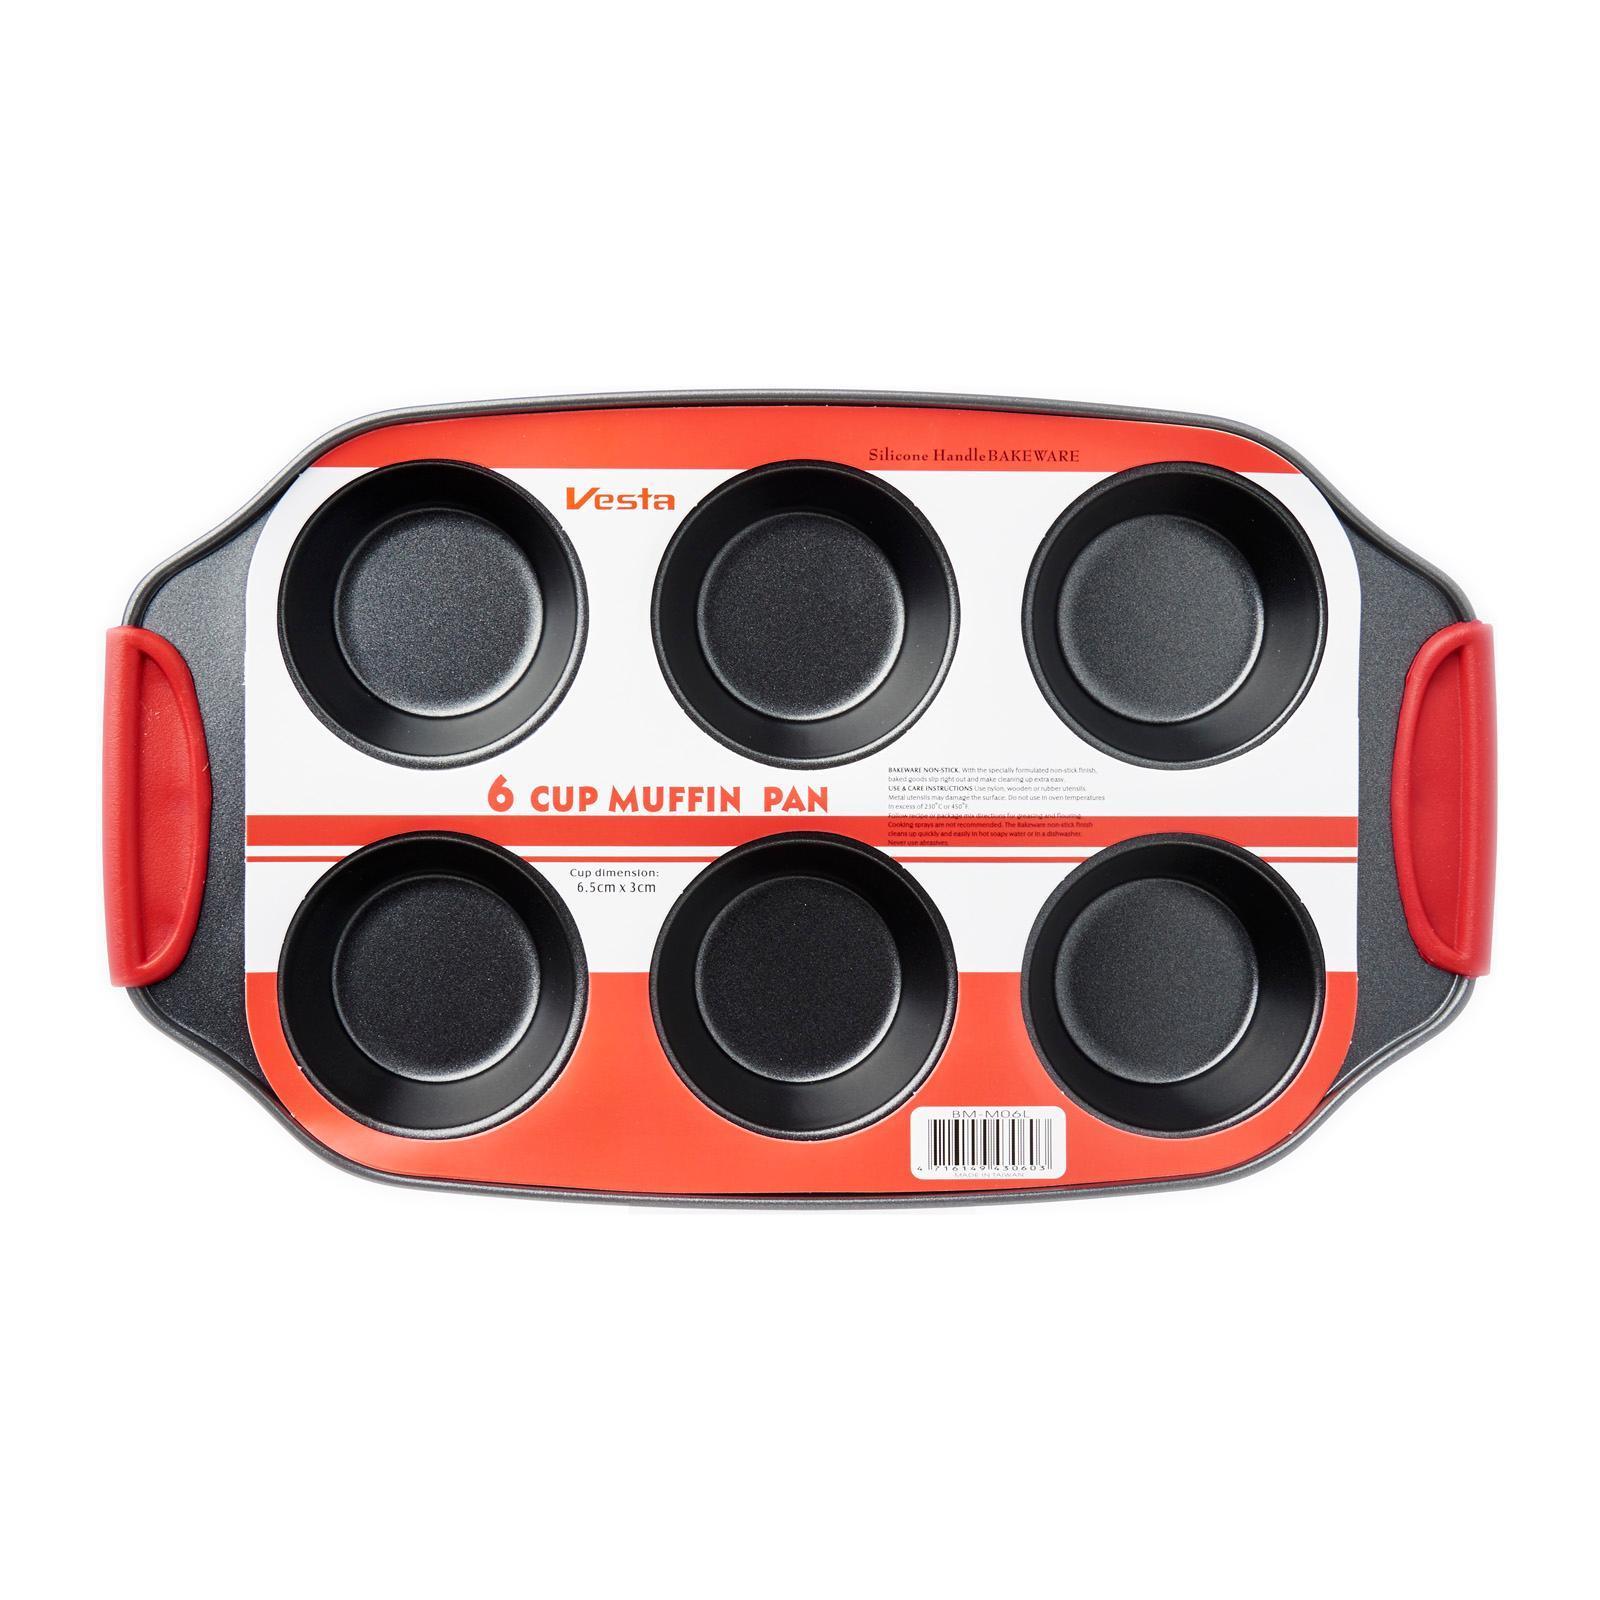 Vesta Silicone Handle Muffin Pan - 6 cup x 6.5cm